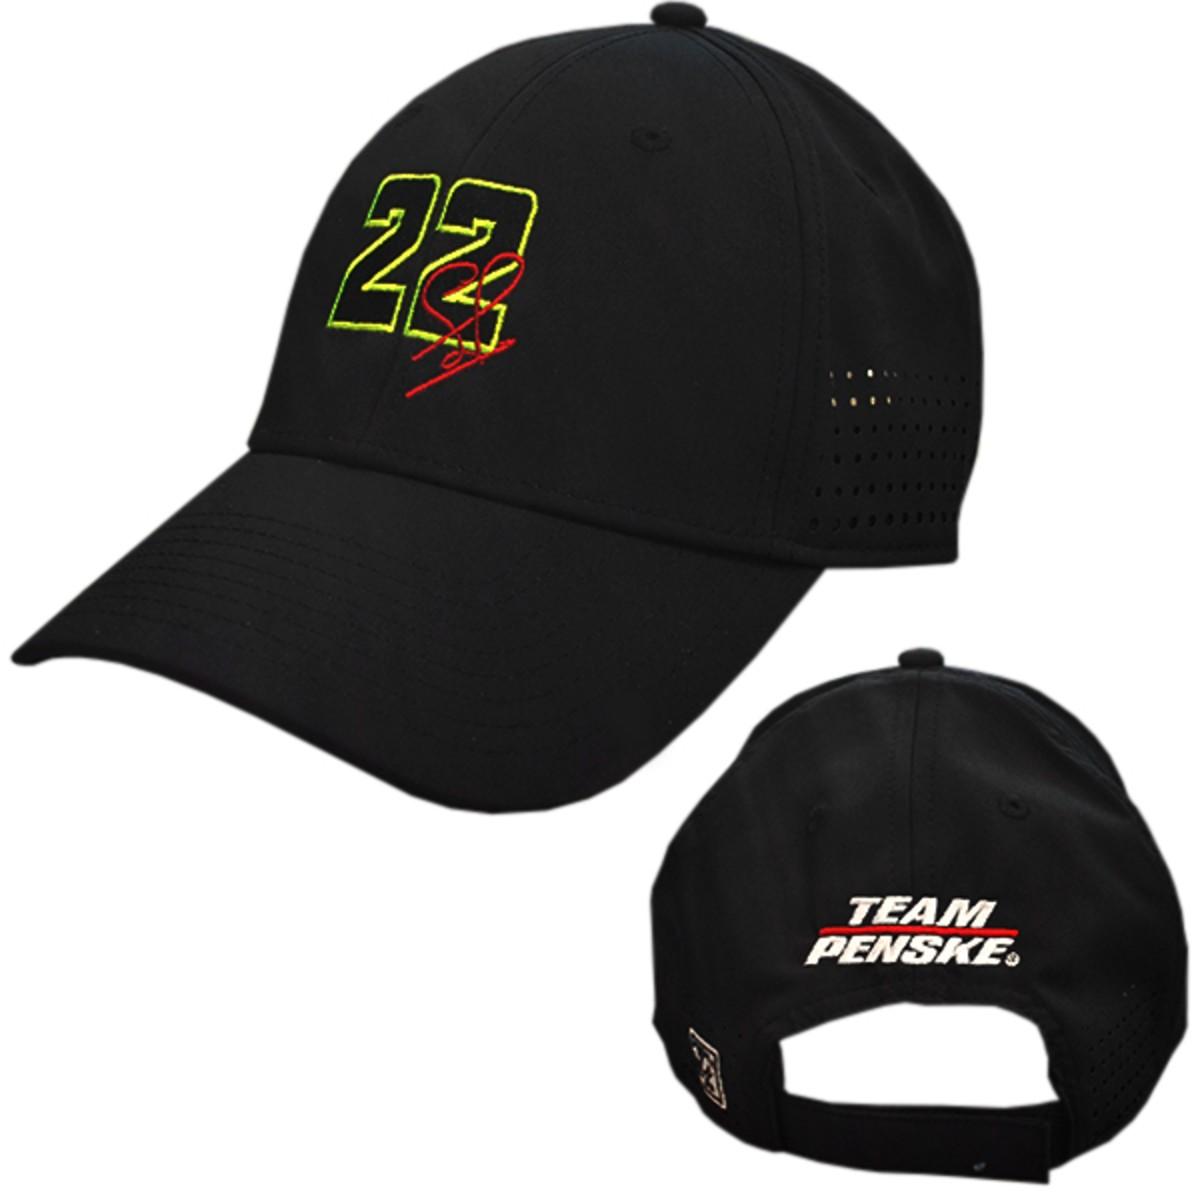 Simon Pagenaud #22 Team Penske Stealth Cap